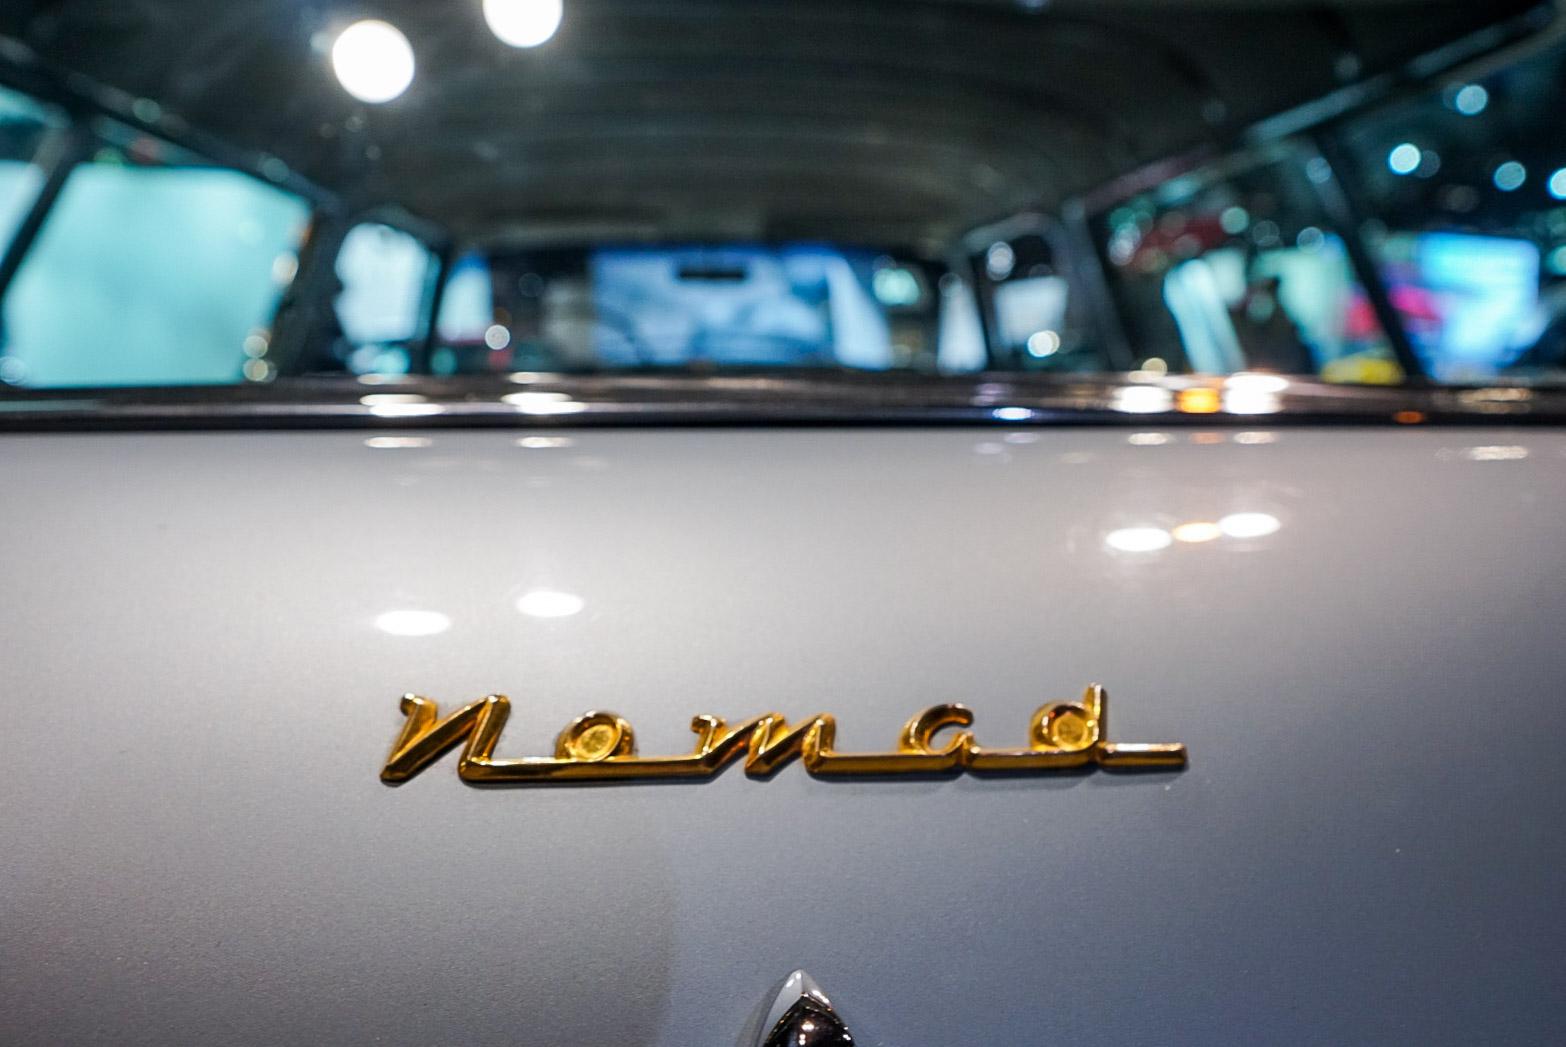 1954 Chevrolet Corvette Nomad replica rear badge